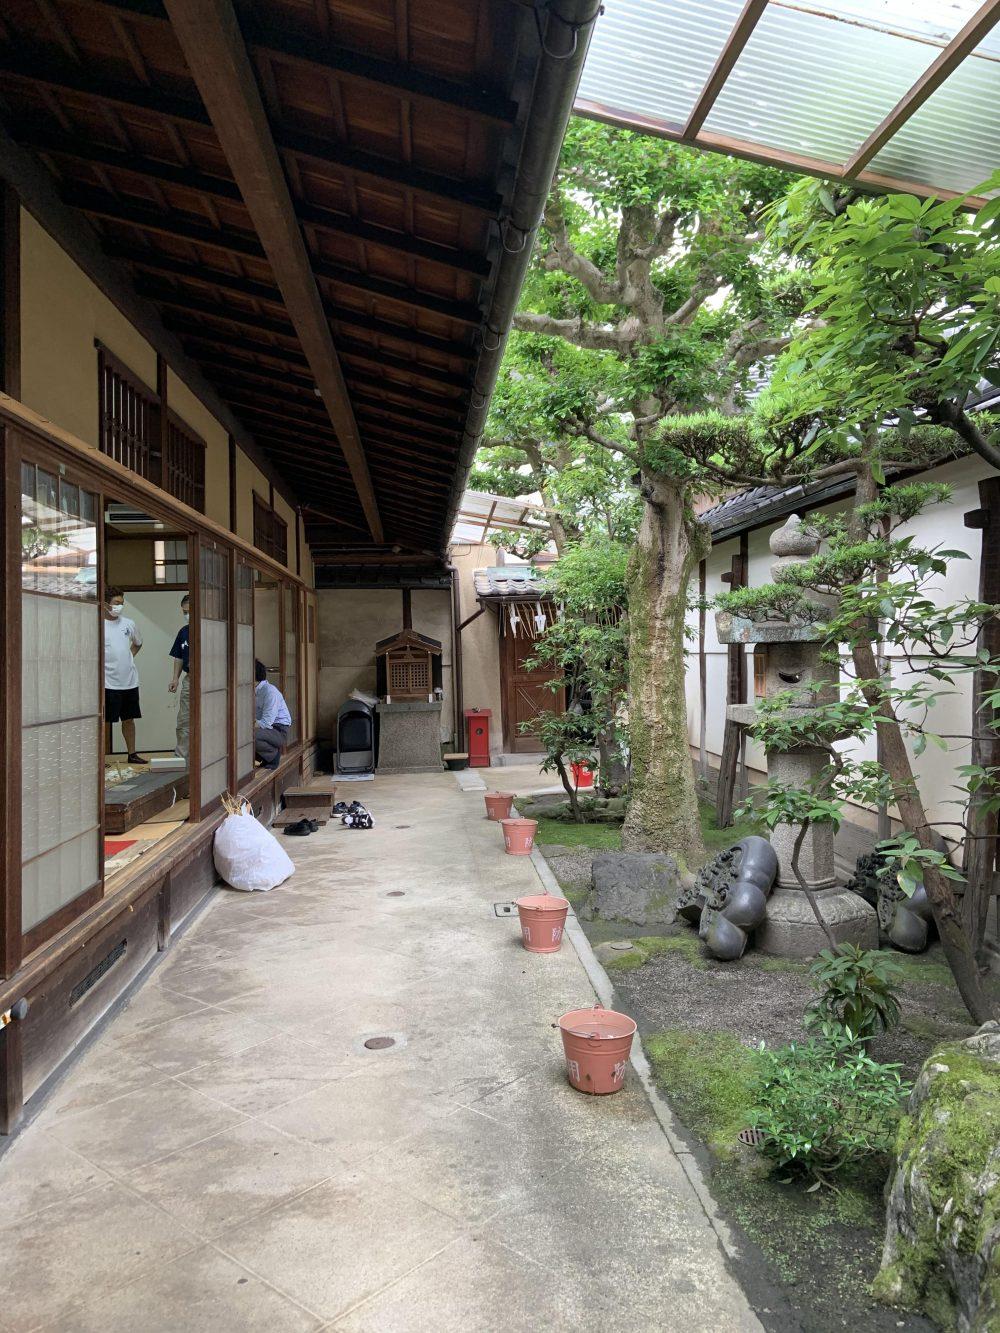 Koiyama_Choseki_(community_building)-min